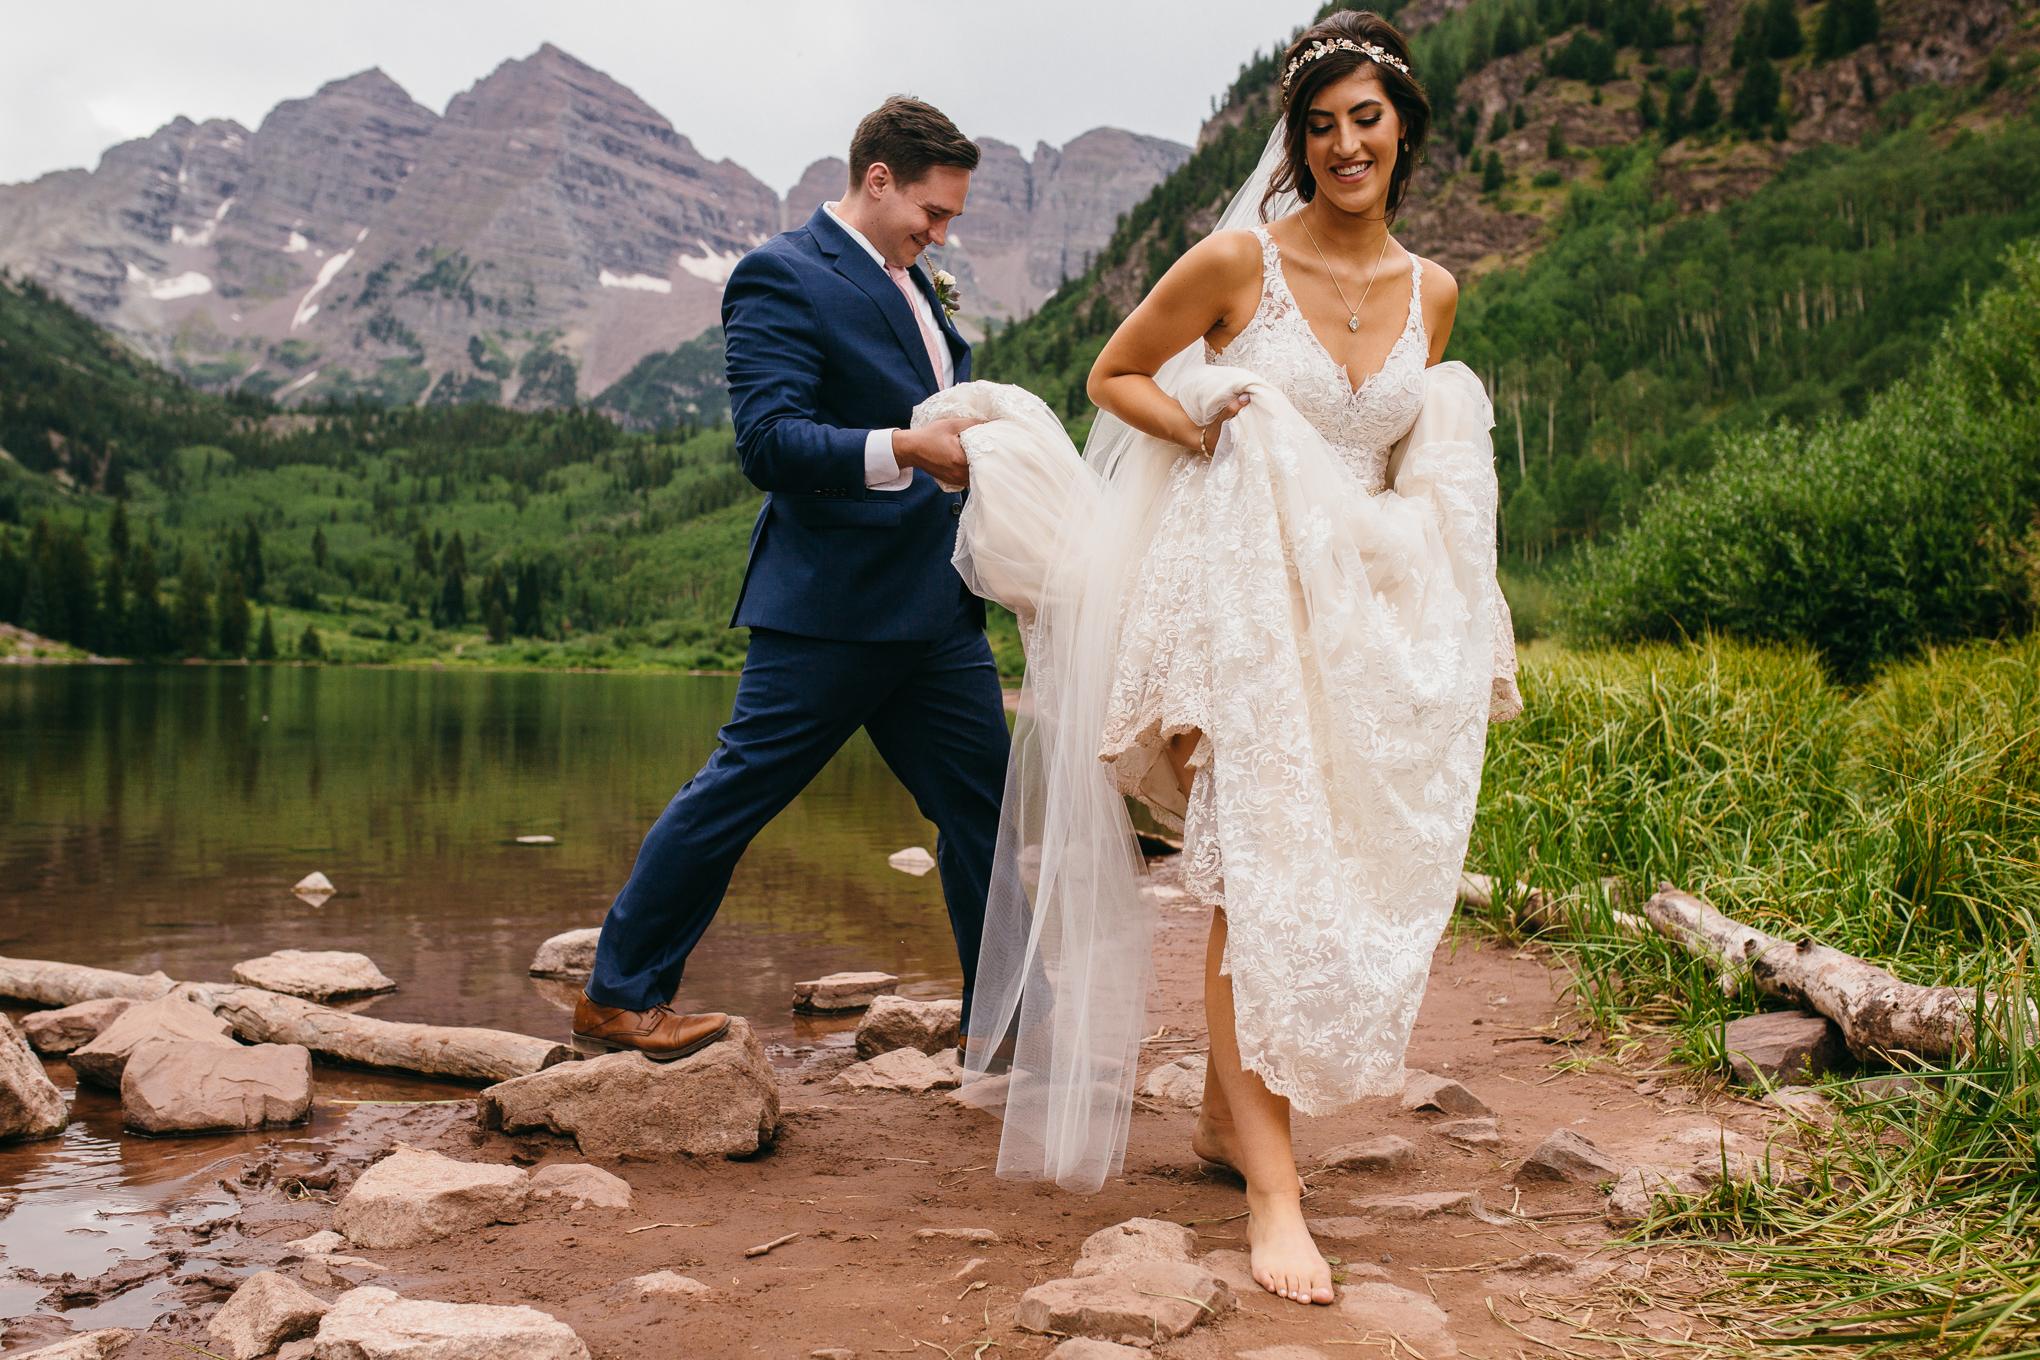 Smiling elopement couple walking away from Maroon Bells, Aspen Colorado.